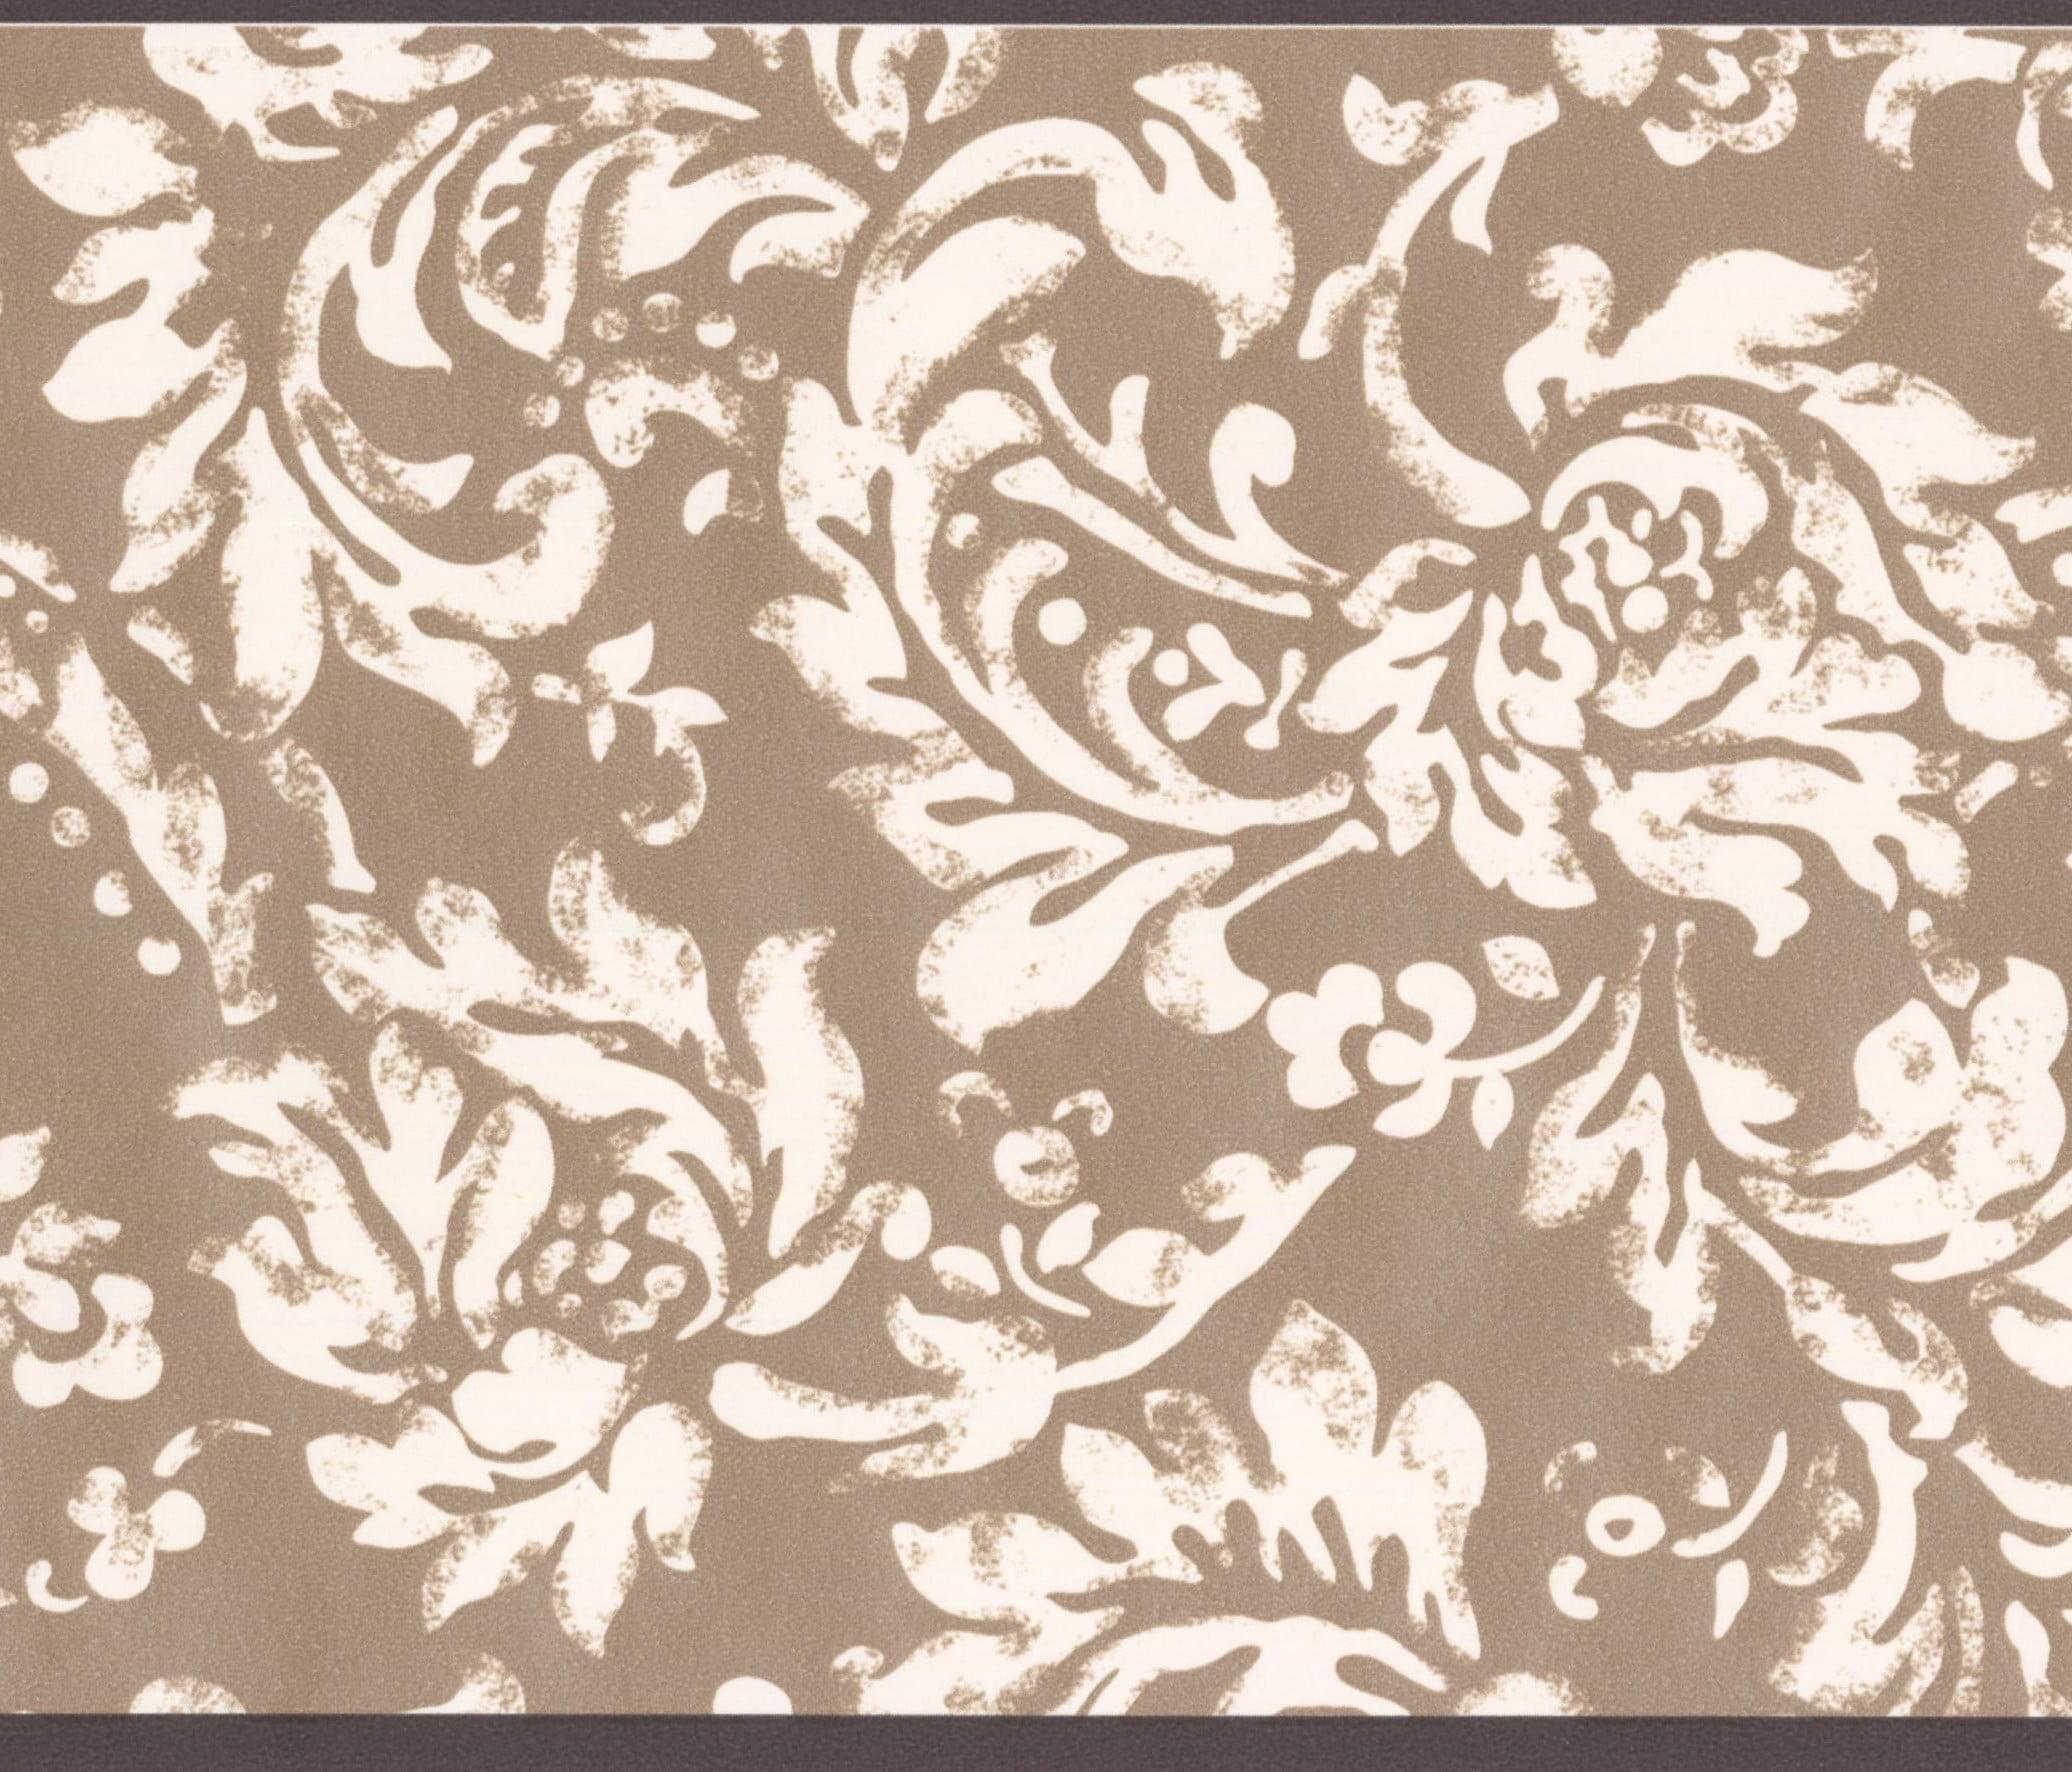 modern white floral pattern brown damask wallpaper border vintageprevious; next